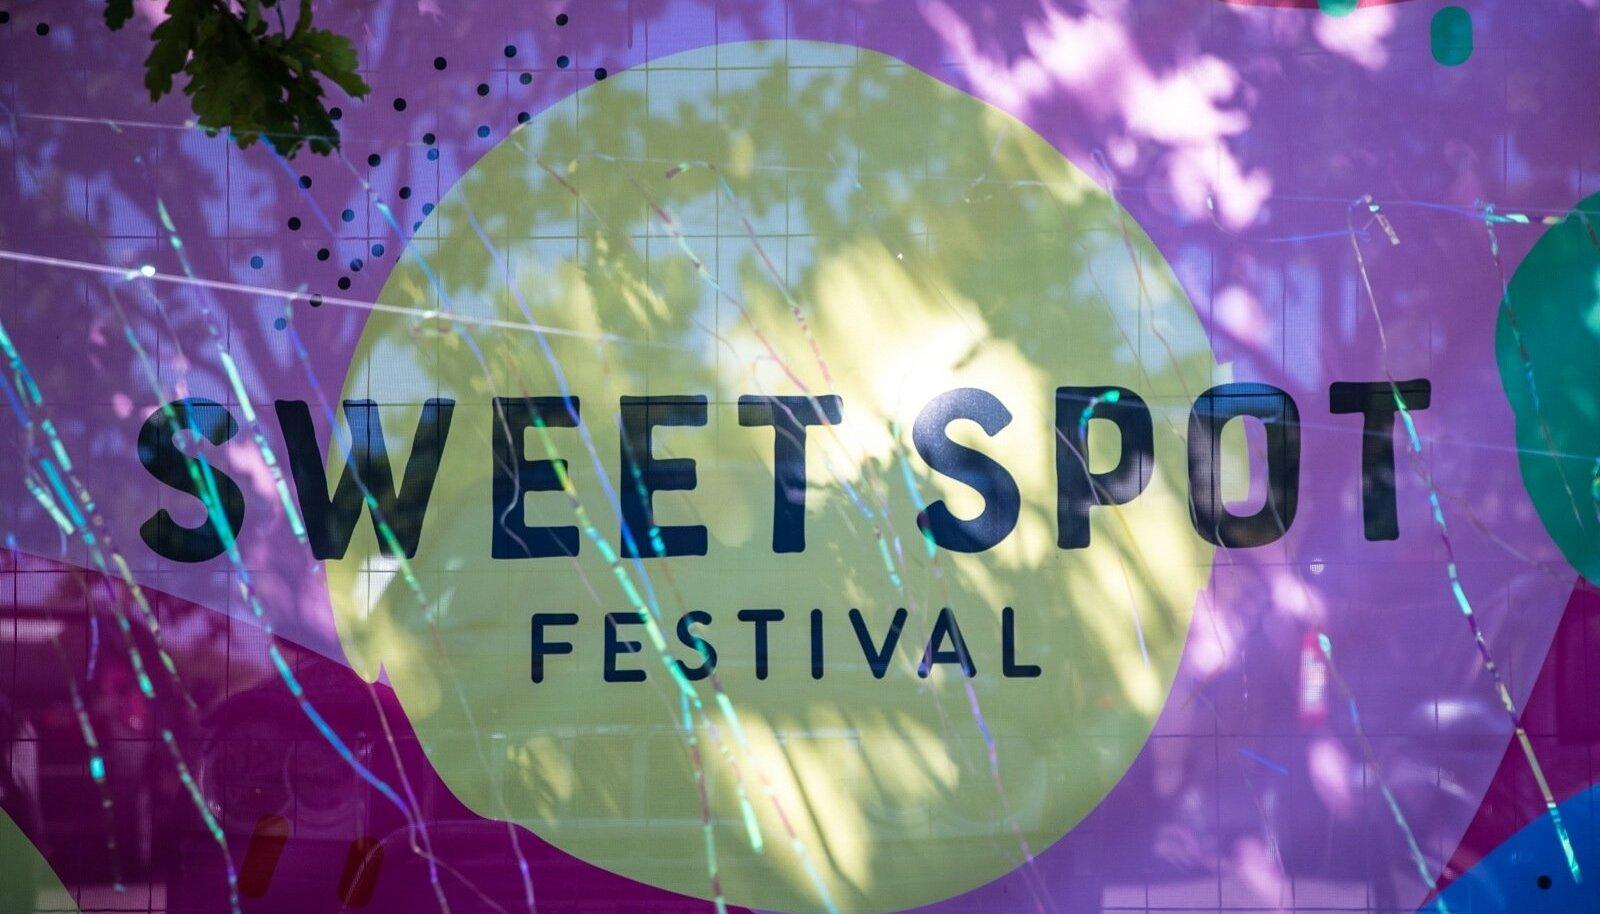 Mullune Sweet Spoti festival.